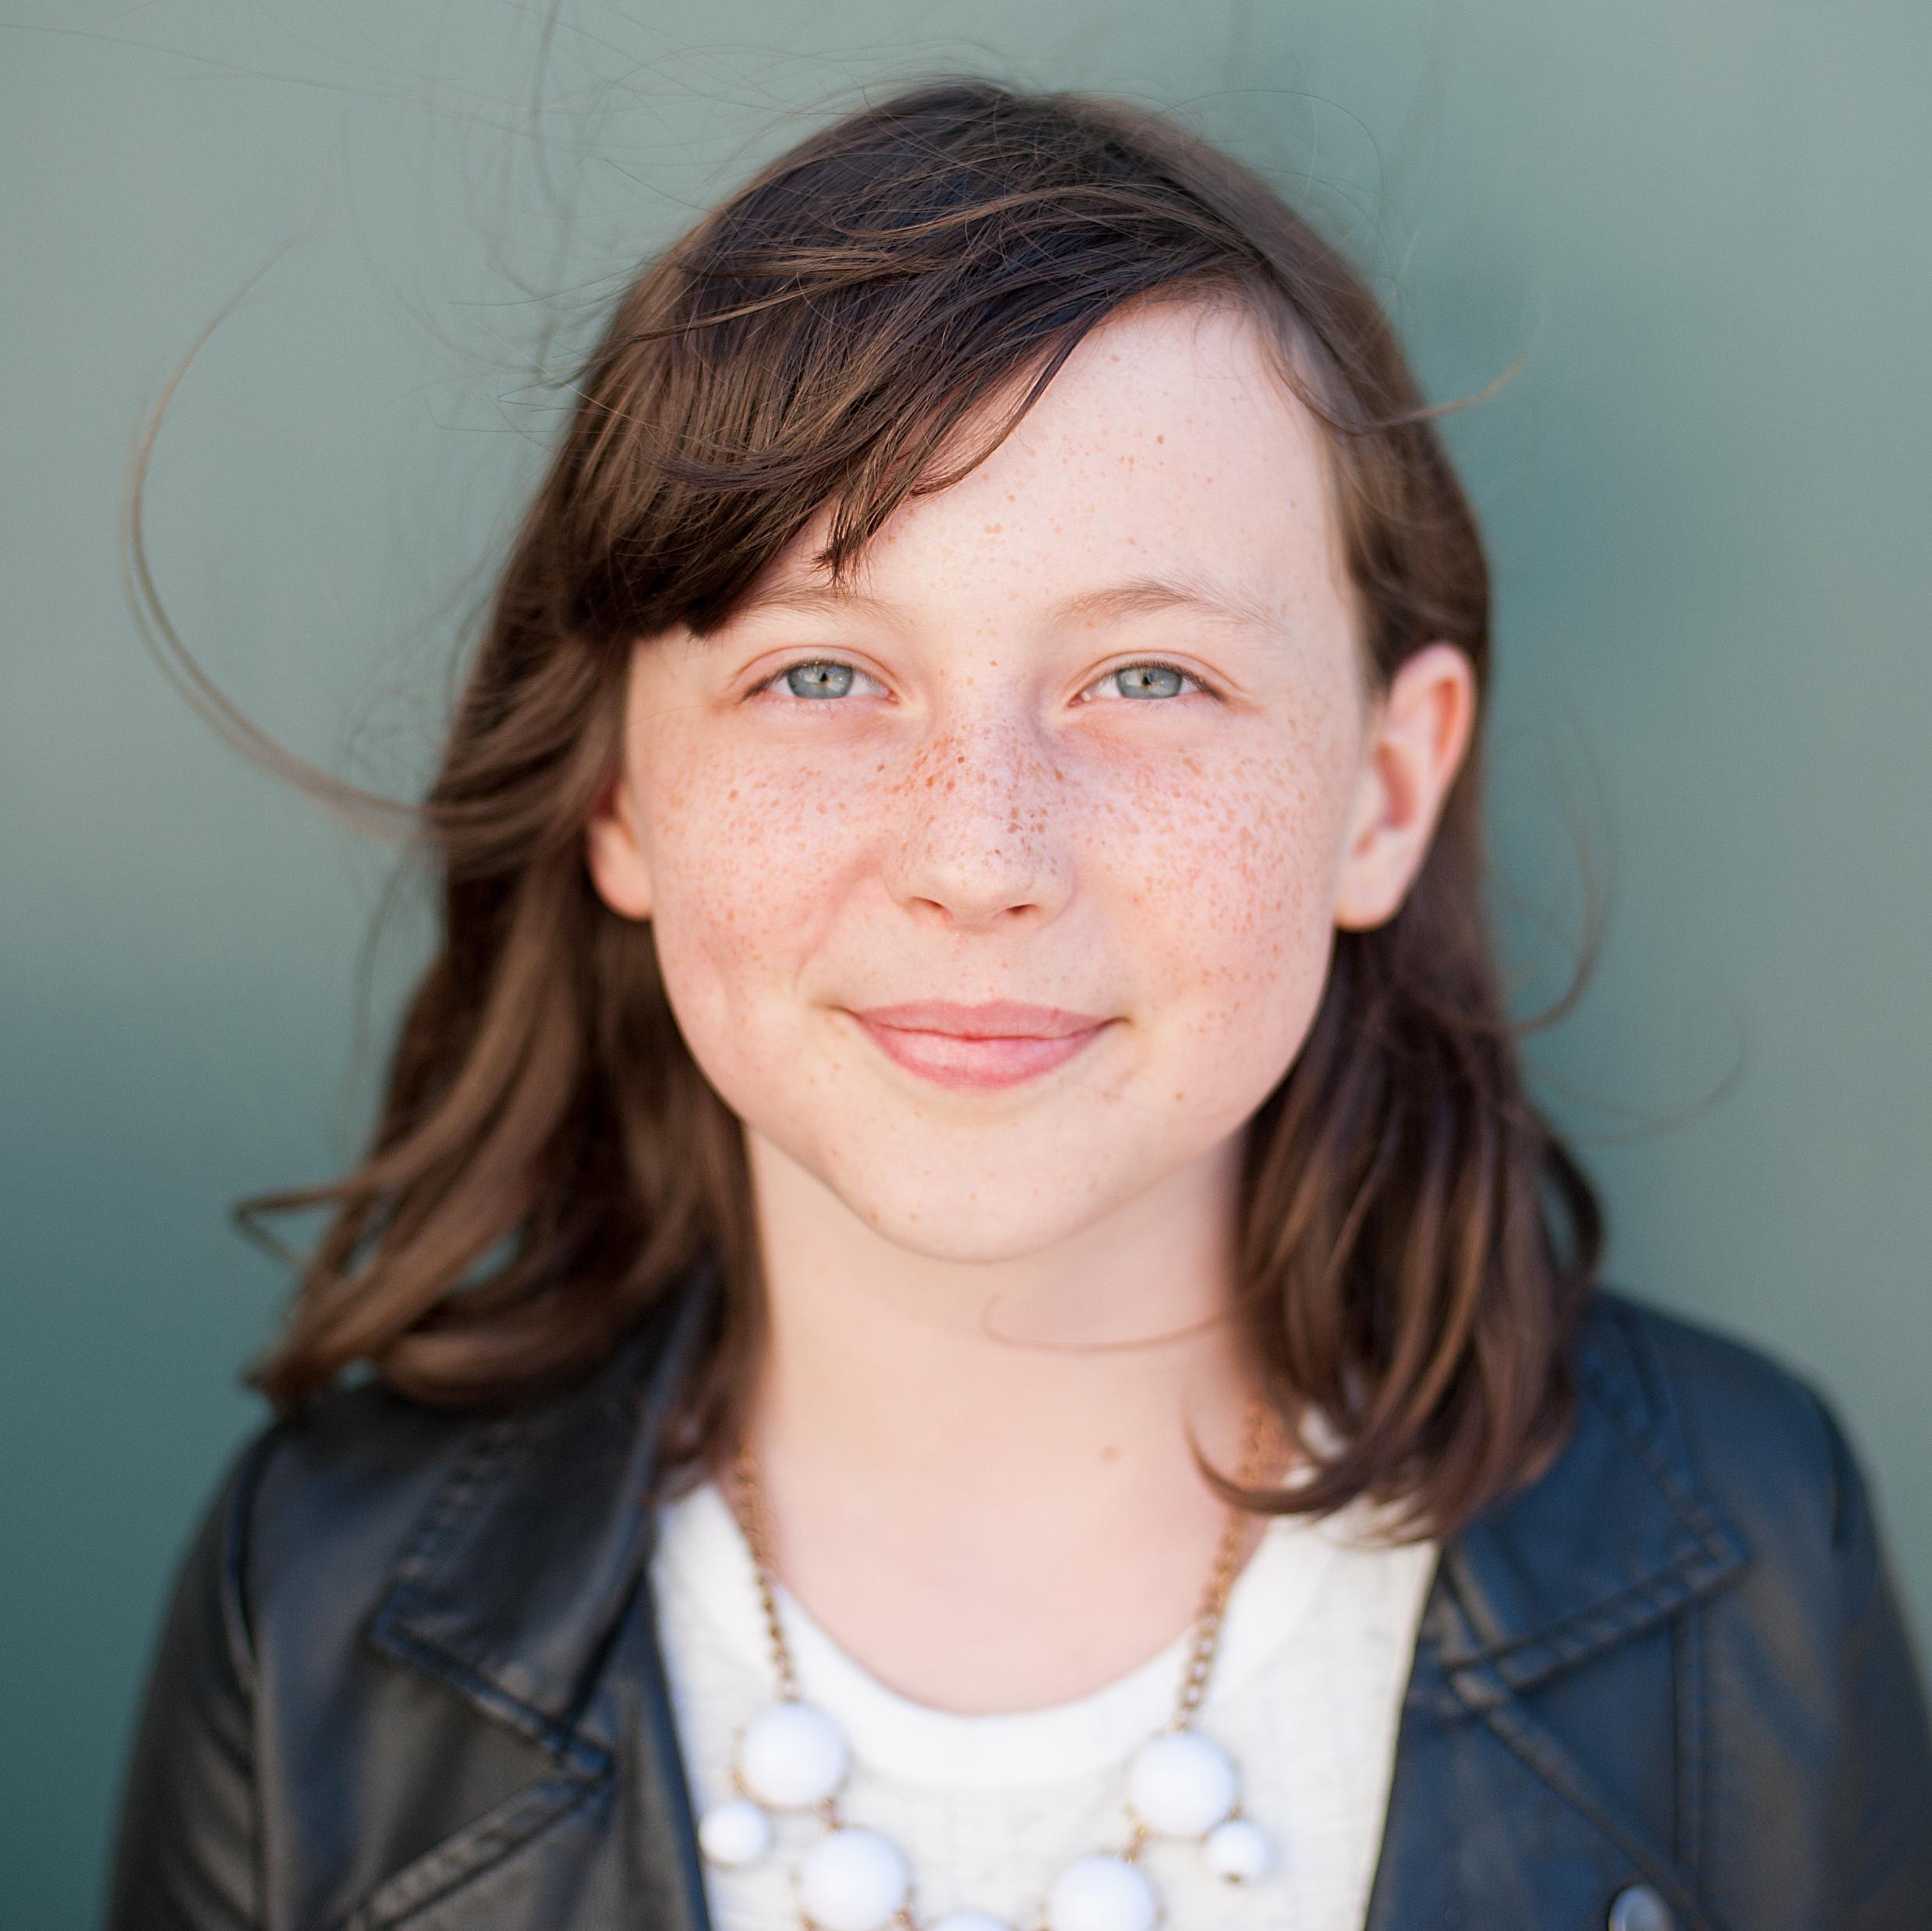 IZZI GREYSON  | 11 Years Old